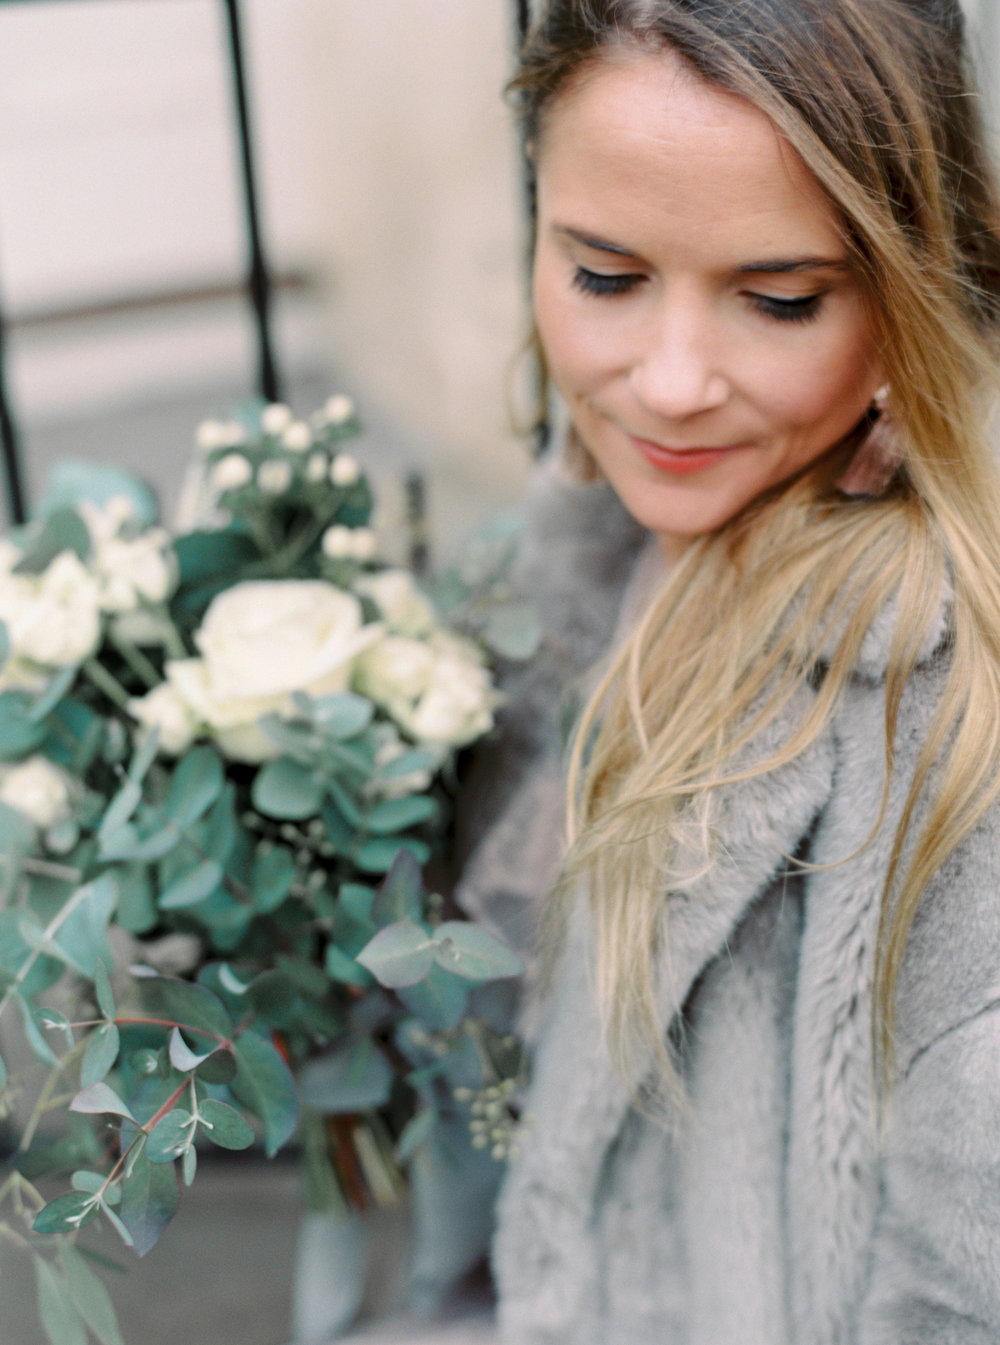 Luxury Wedding Planner UK | Our Chic & Romantic Engagement Shoot in Bath | Katie Julia Photography - 5.JPG